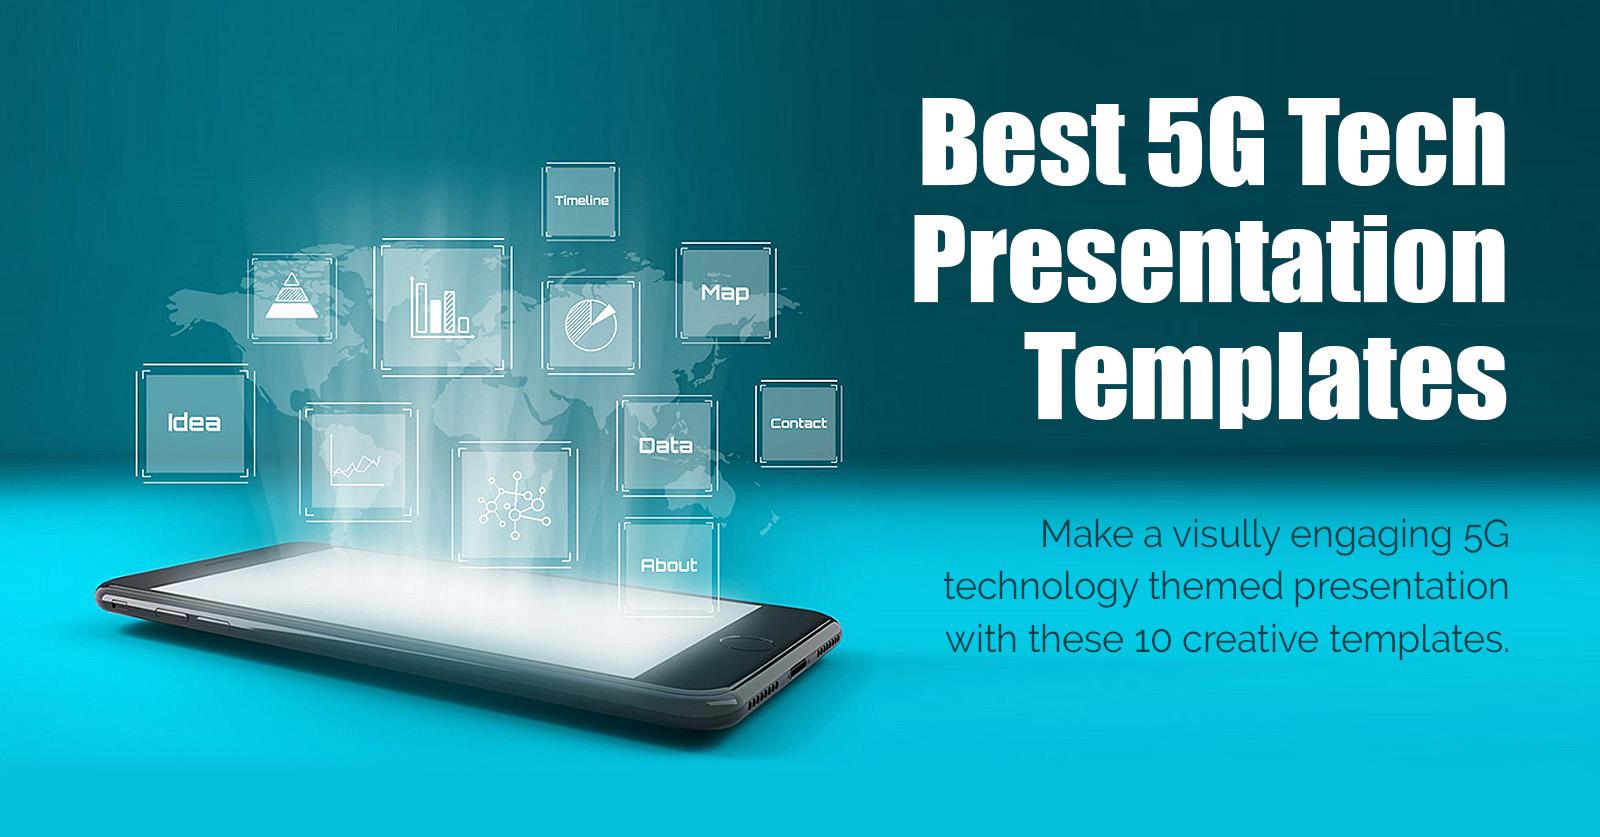 5g-presentation-templates